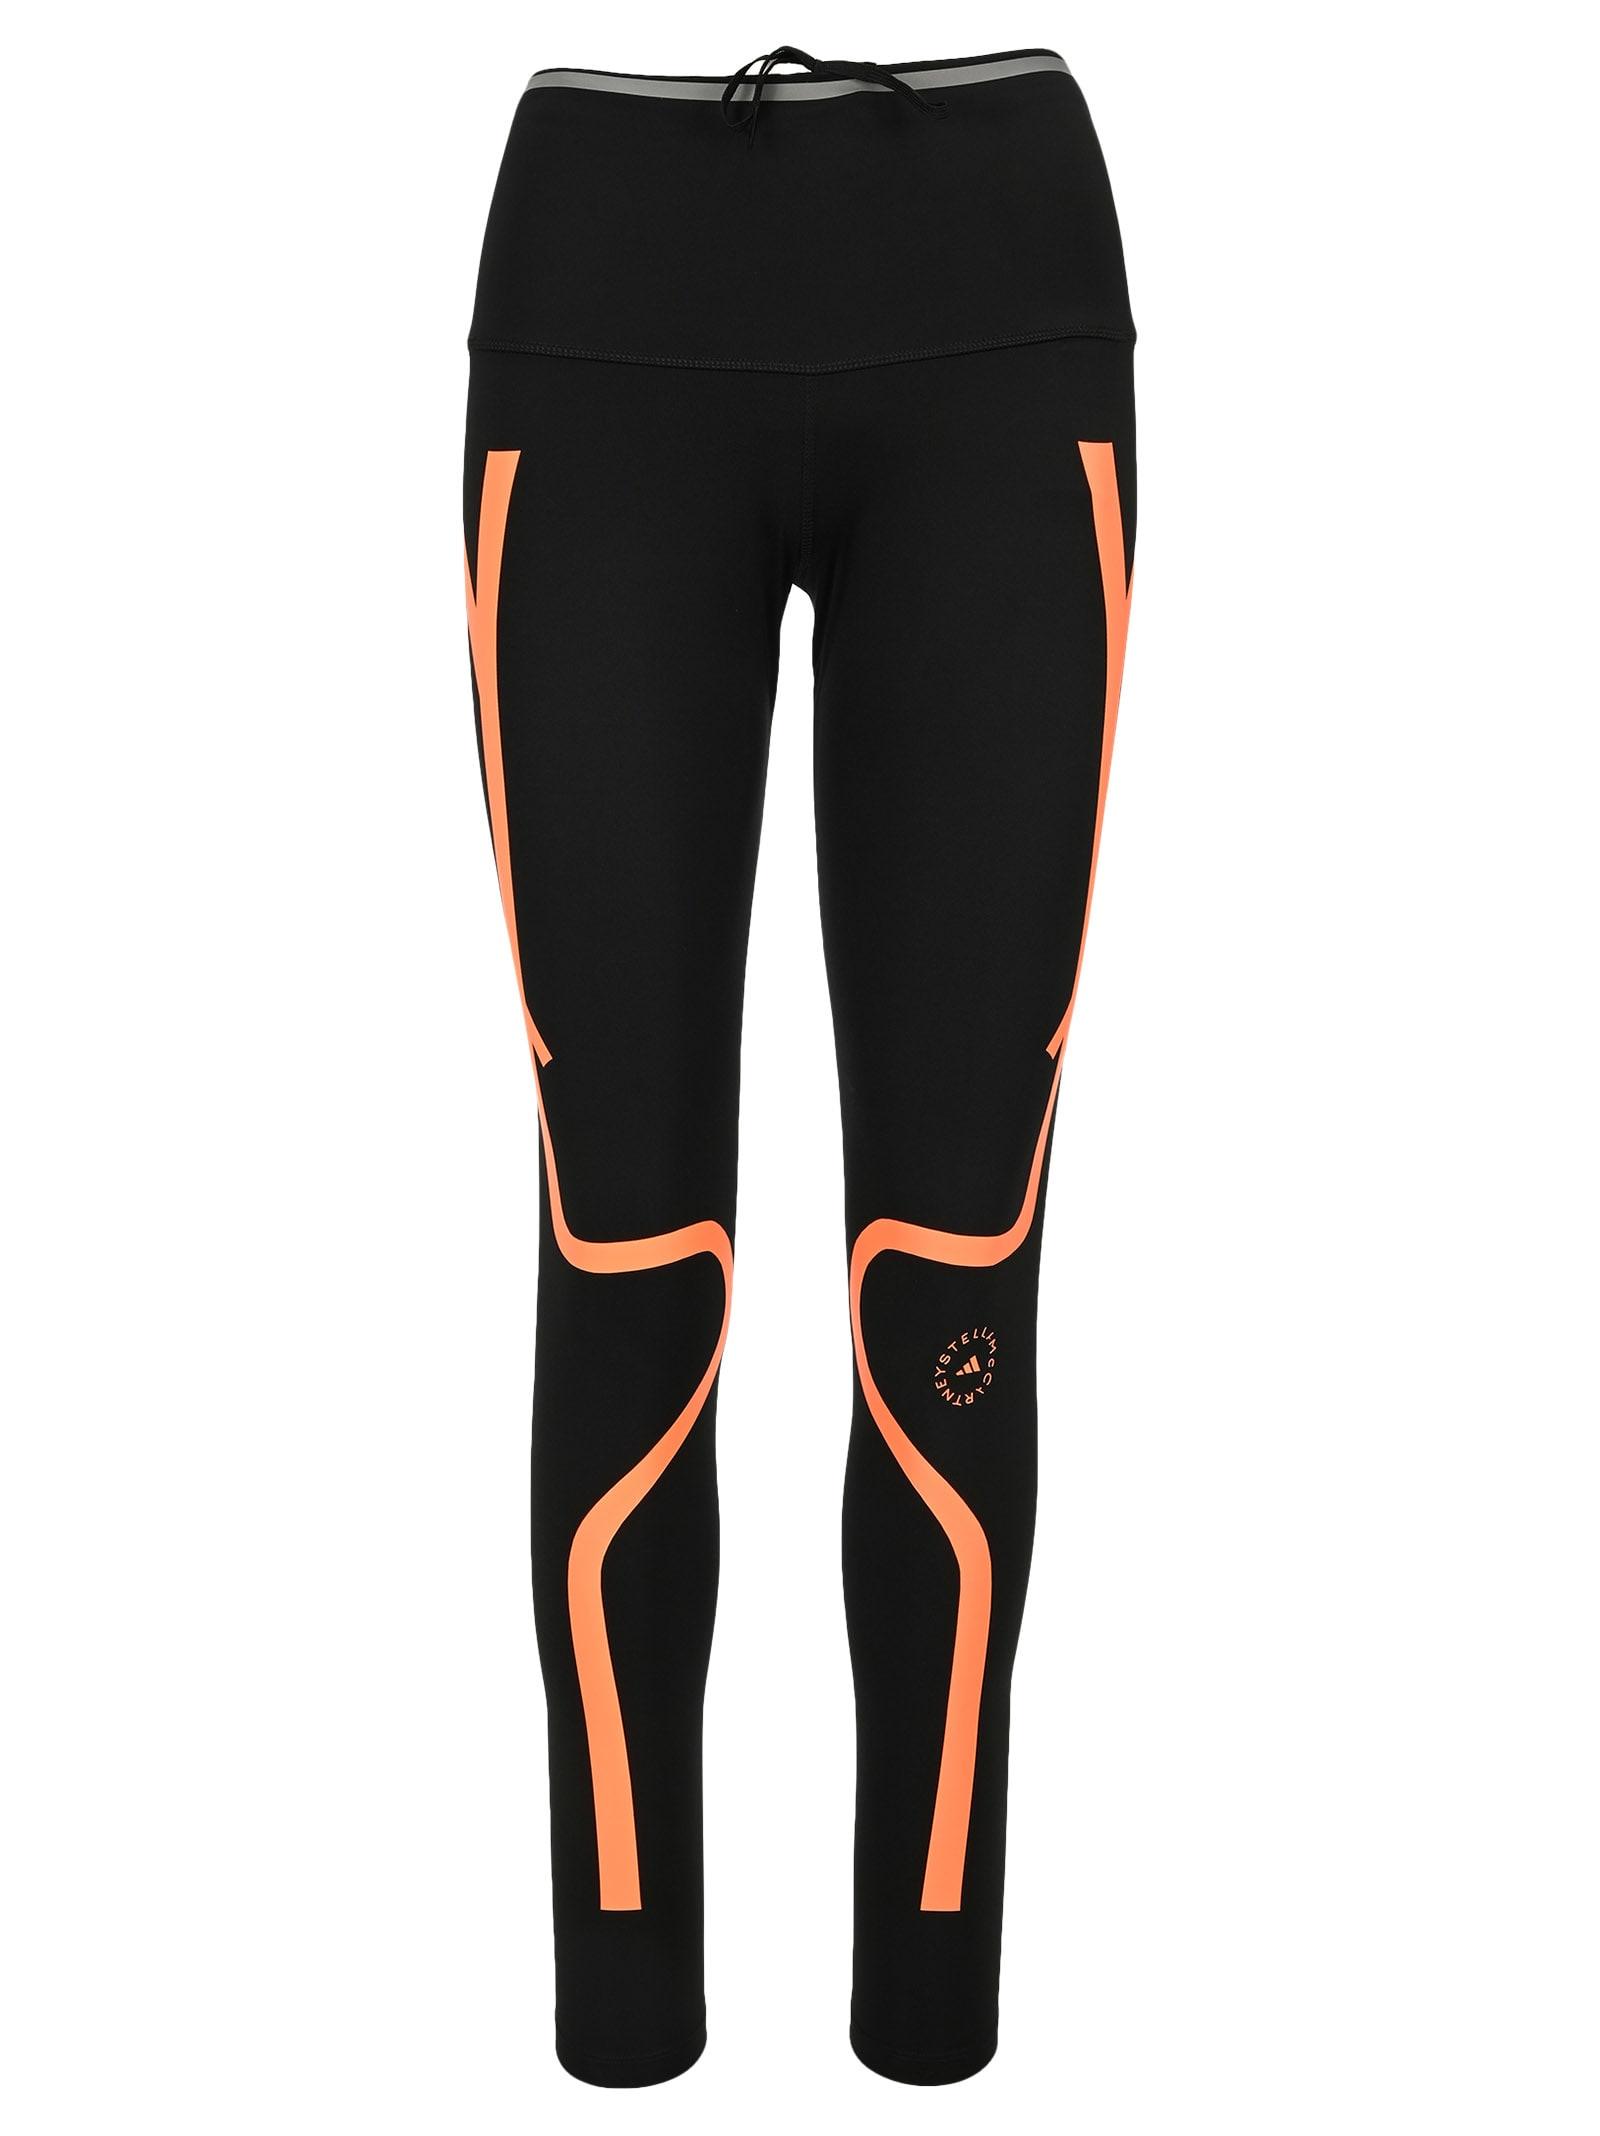 Adidas By Stella Mccartney Two-tone Performance Leggings